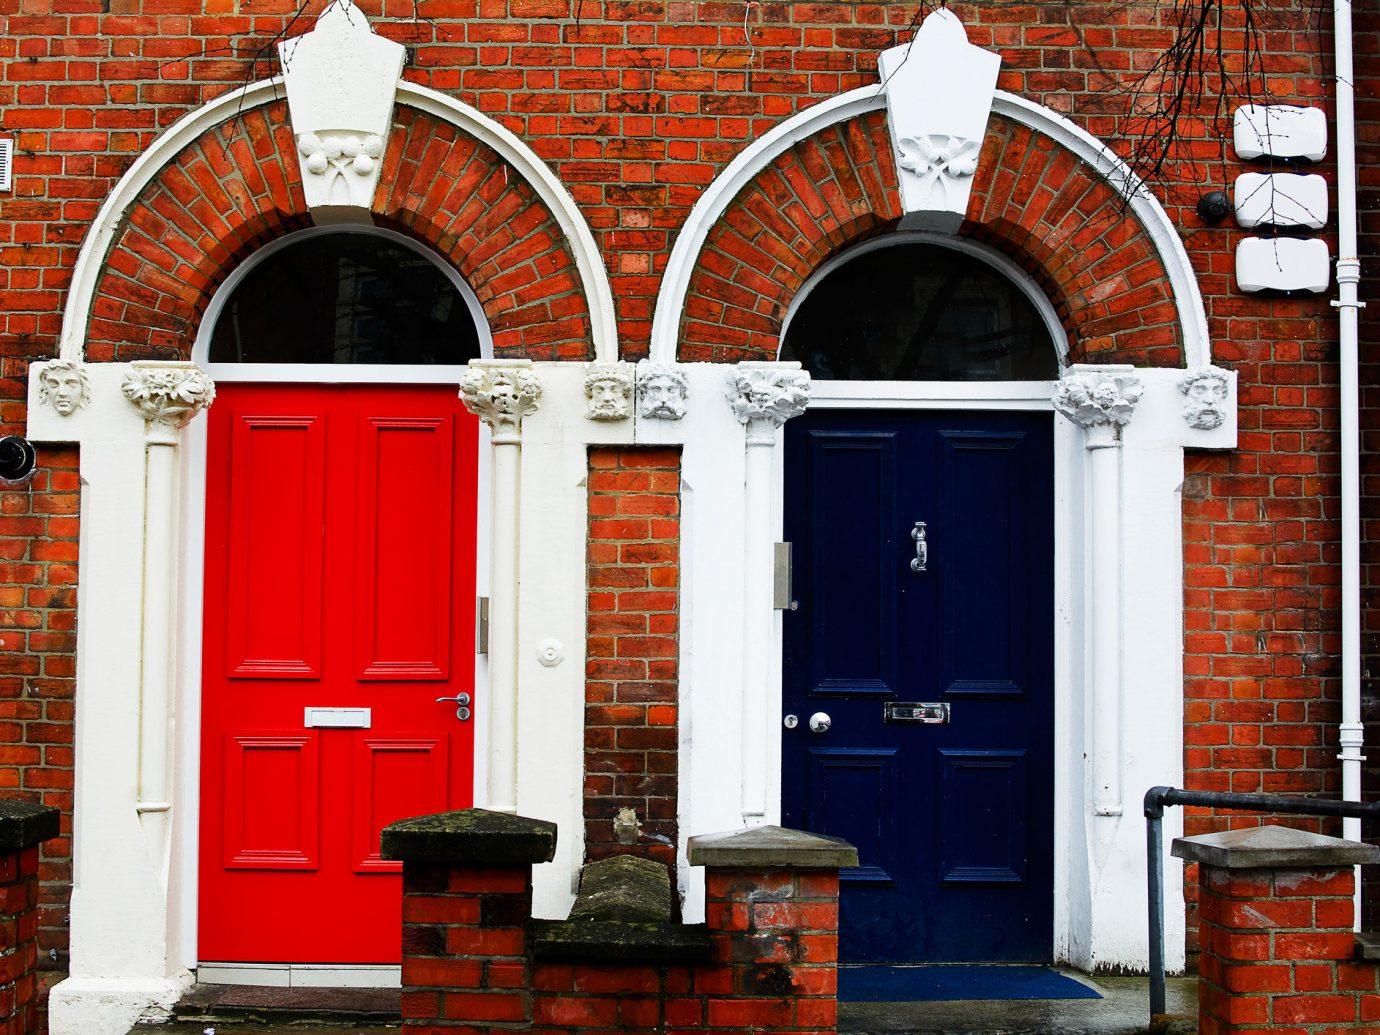 Offbeat building brick outdoor color red door sidewalk arch parked Architecture facade window stone interior design step chapel doorway curb